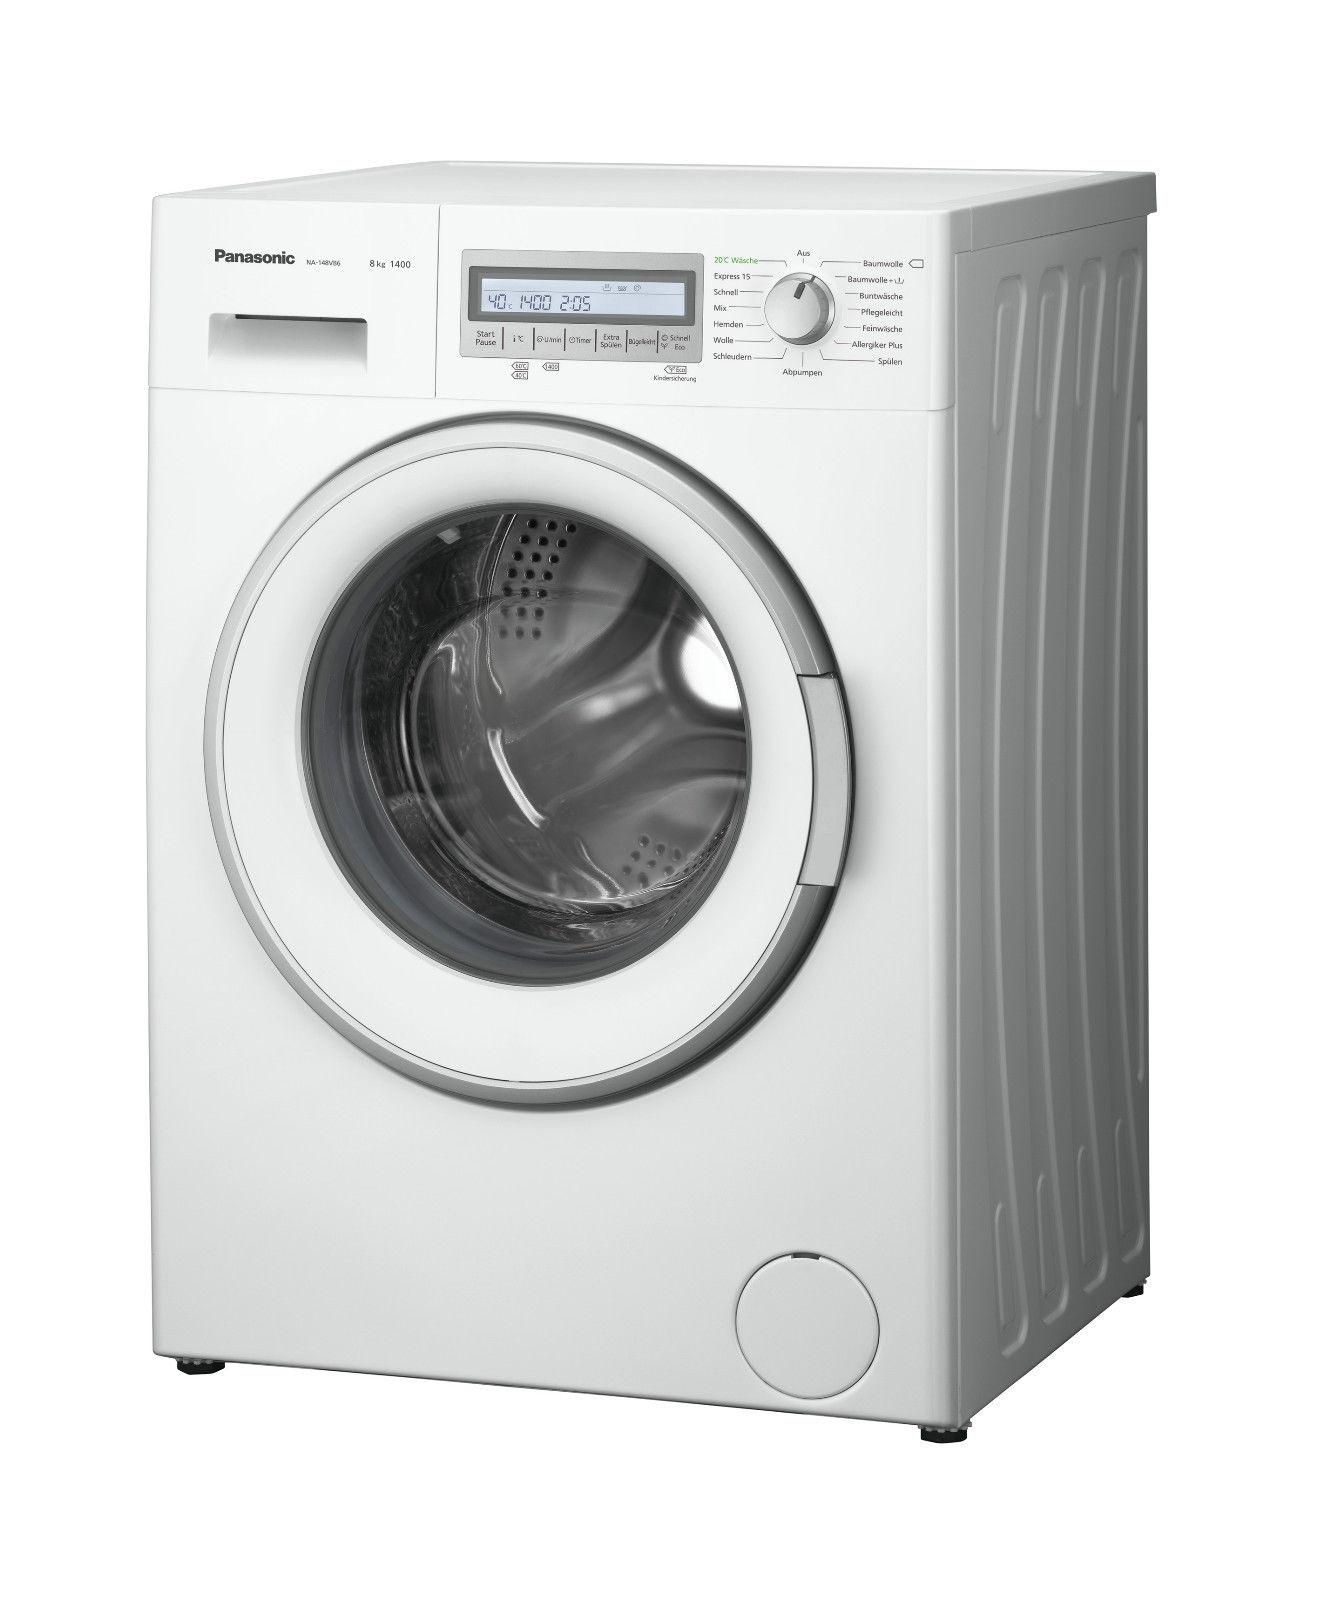 Panasonic Waschmaschine NA-A 47VB6 [MediMax Unkel und Asbach, nur lokal]